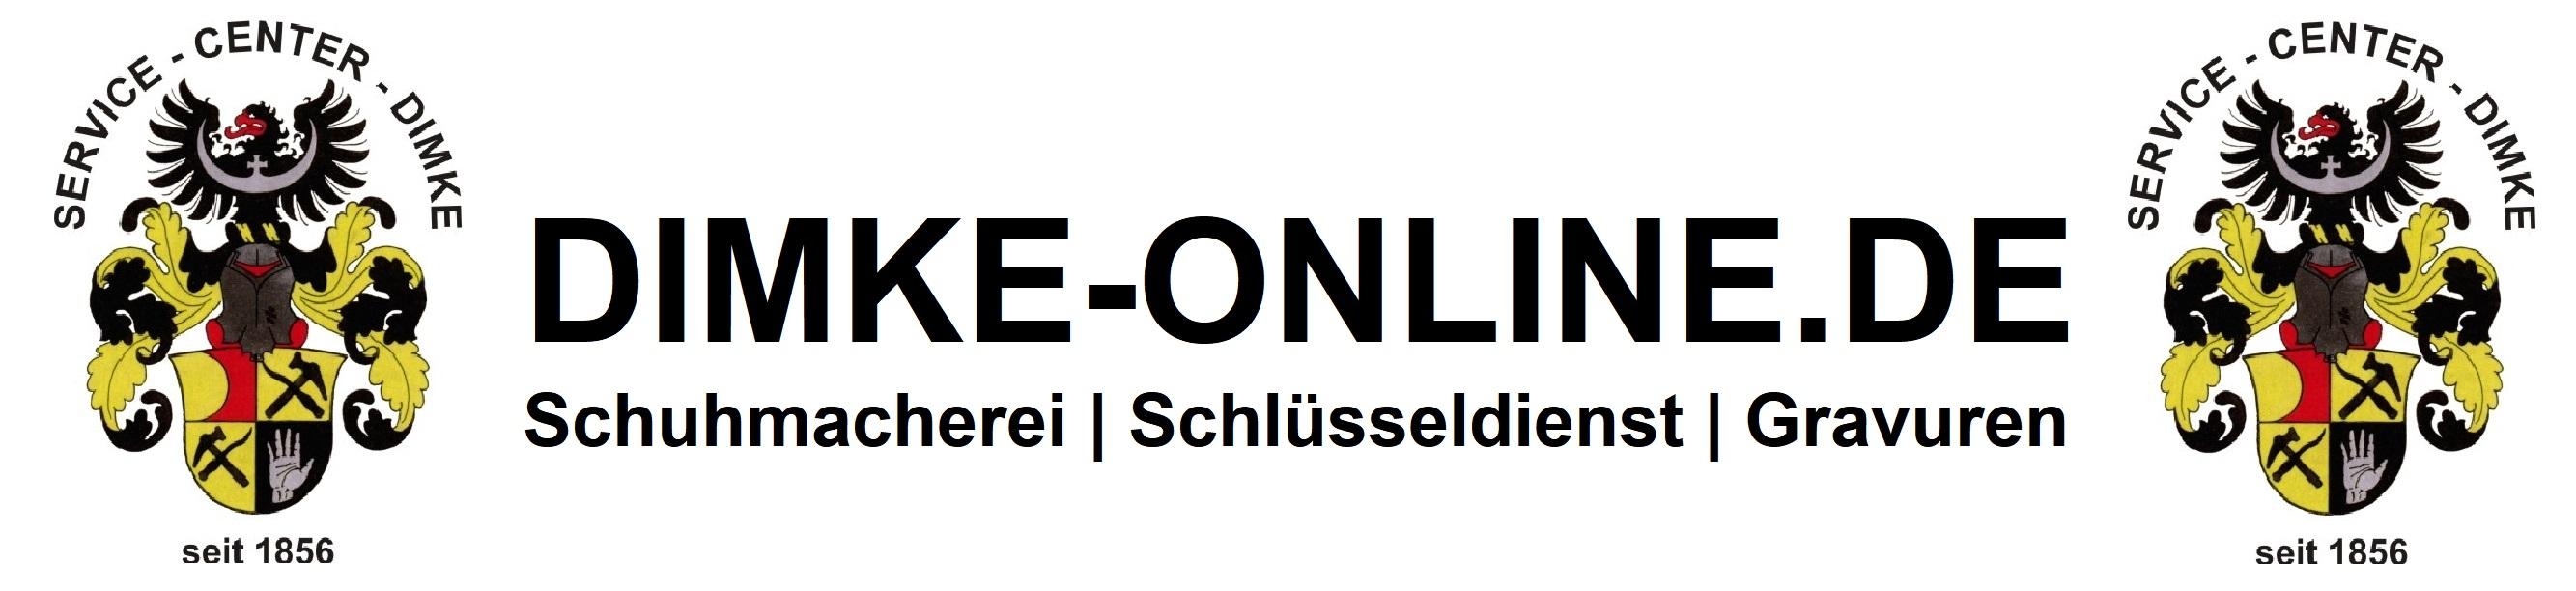 DIMKE-ONLINE.DE